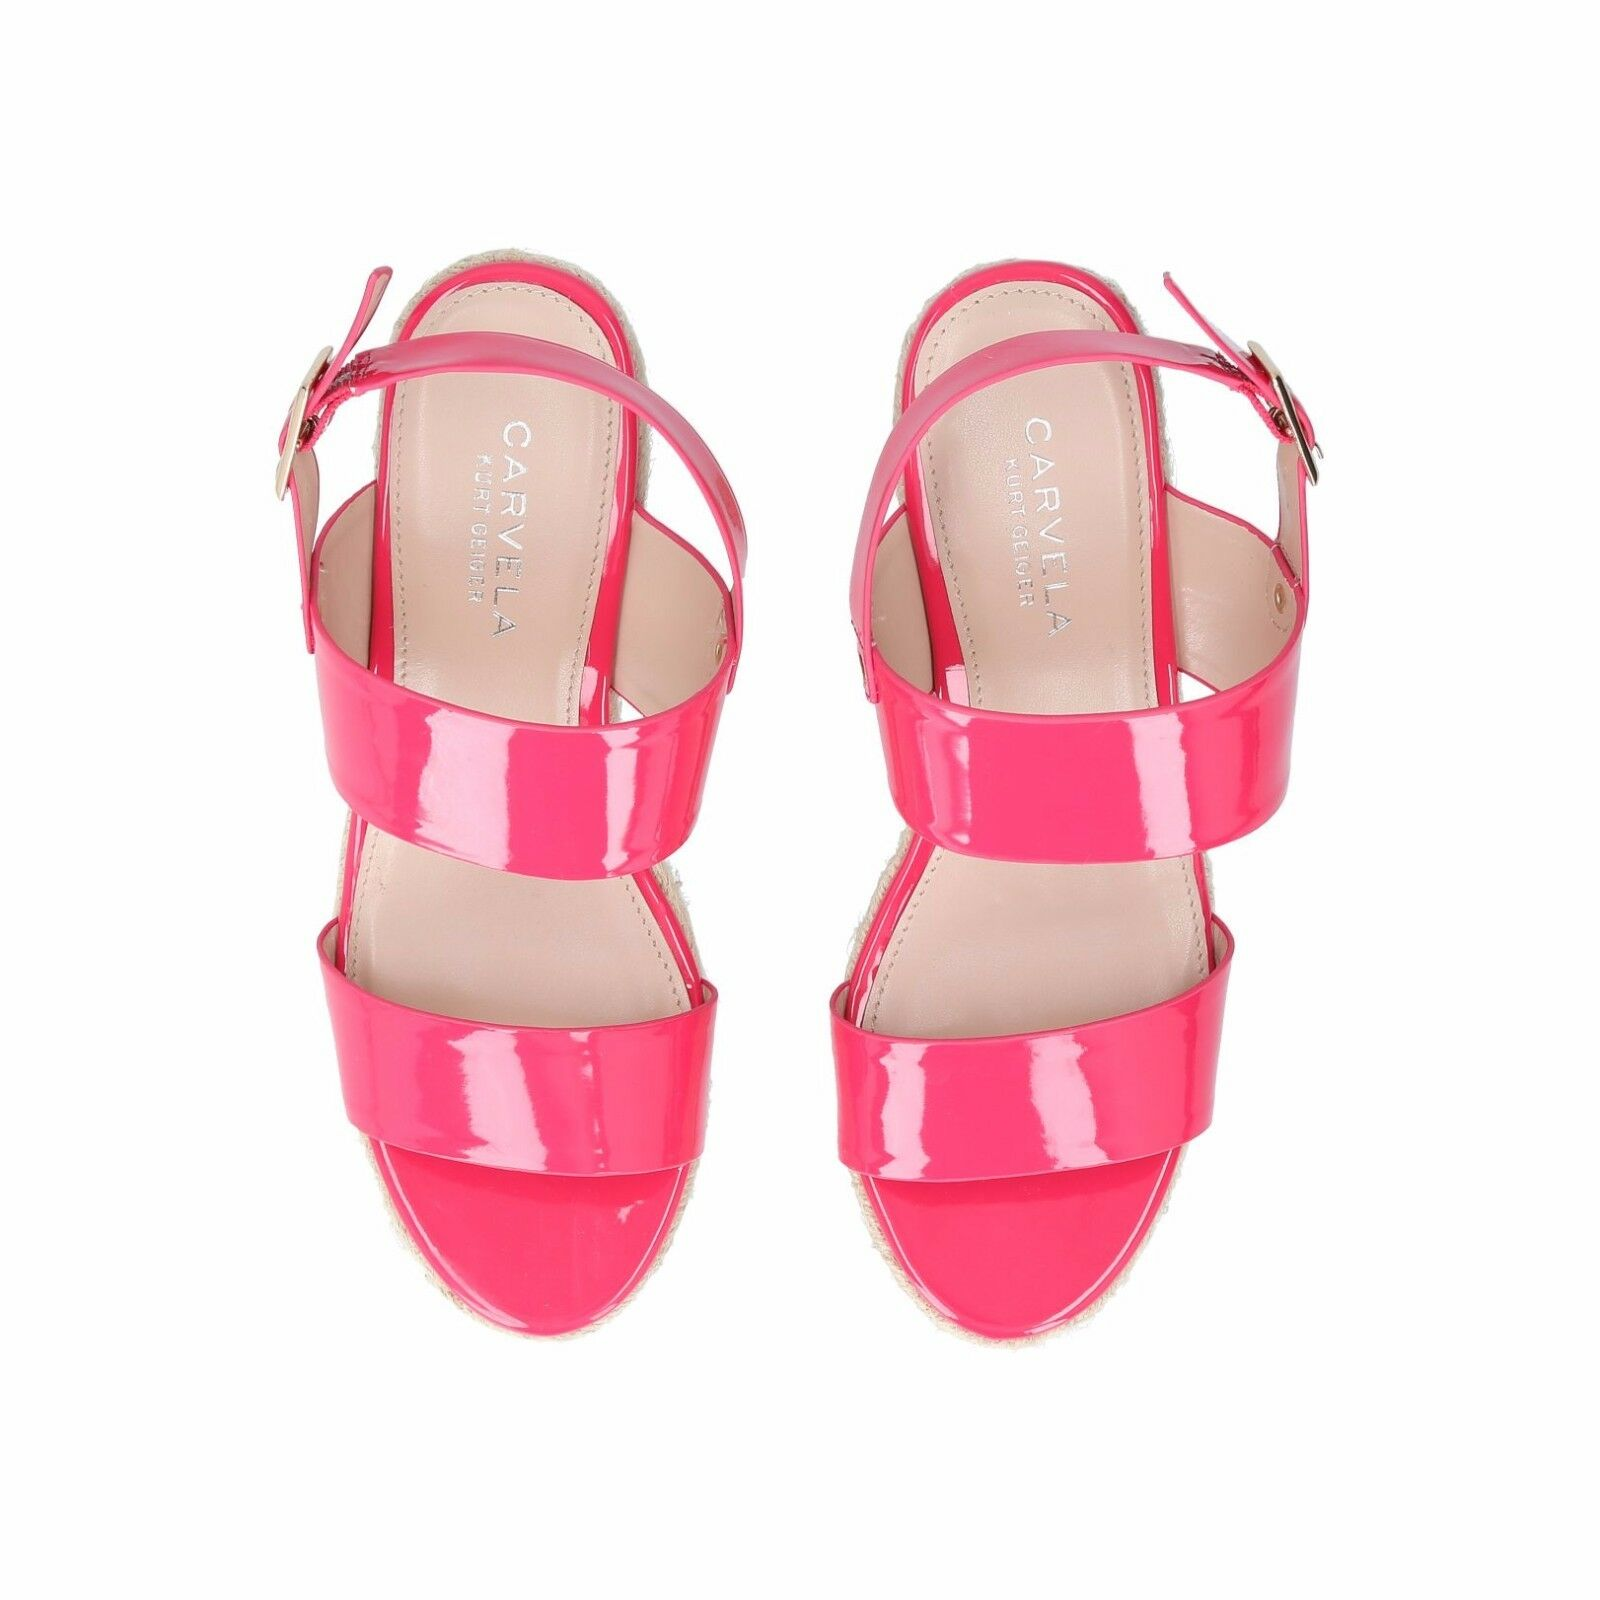 Carvela Bliss Sandals Pink Patent rrp UK UK UK 6 EU 39 JS41 79 SALEs 121fe1